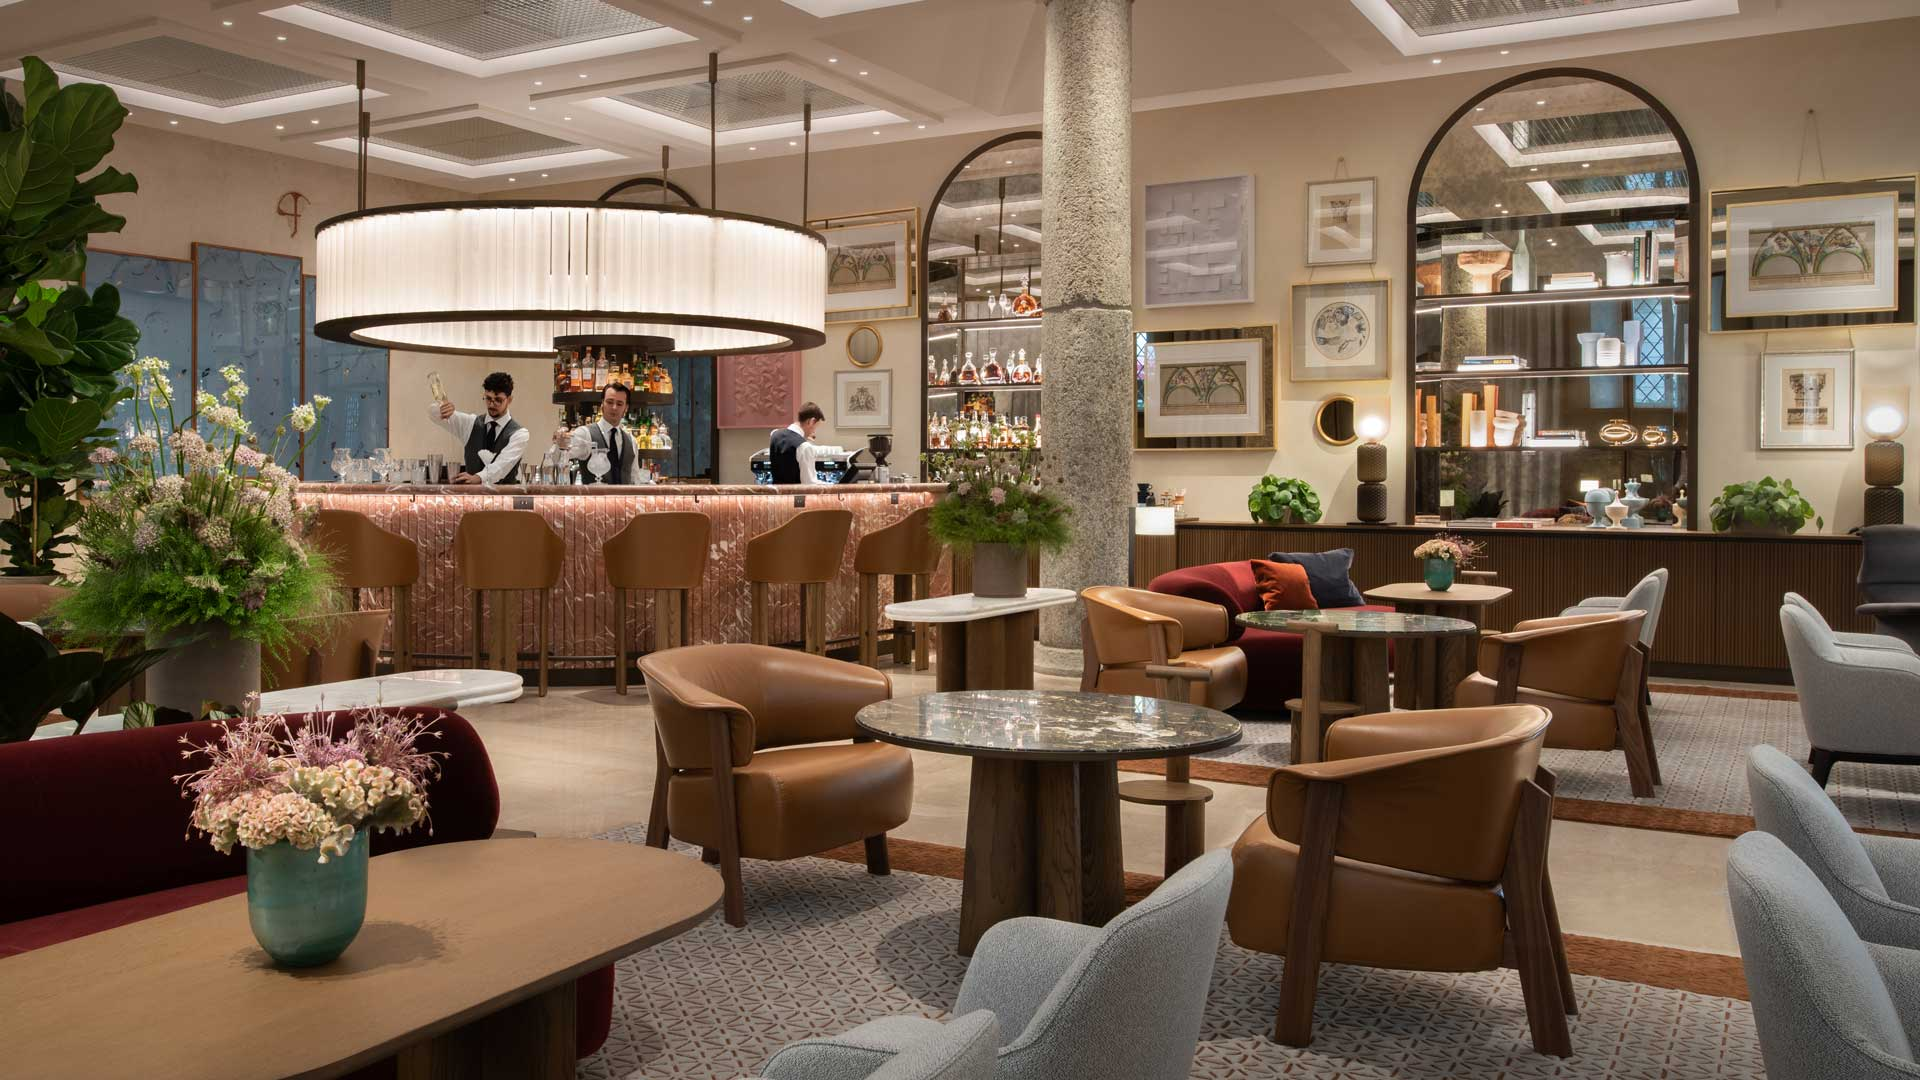 Stilla-Bar-Four-Seasons-Hotel-Milano-Coqtail-Milano